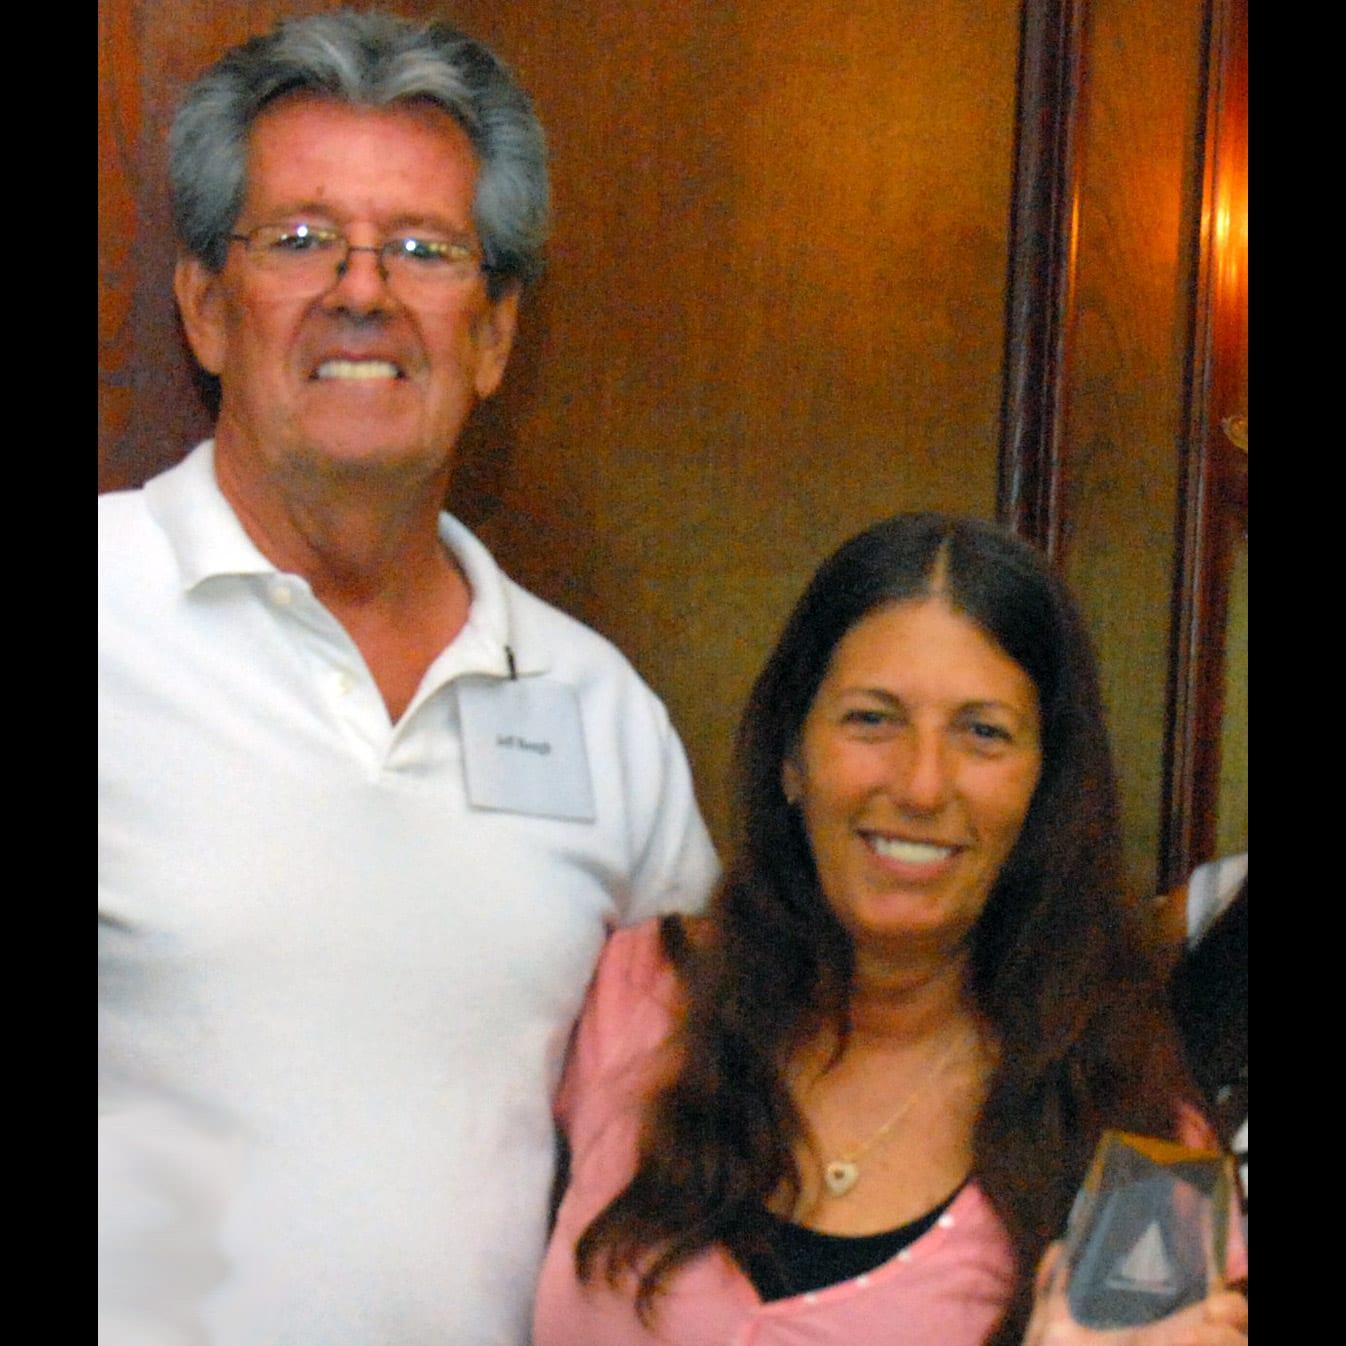 2010 winner Jeff Baugh and Rhonda Kramer.